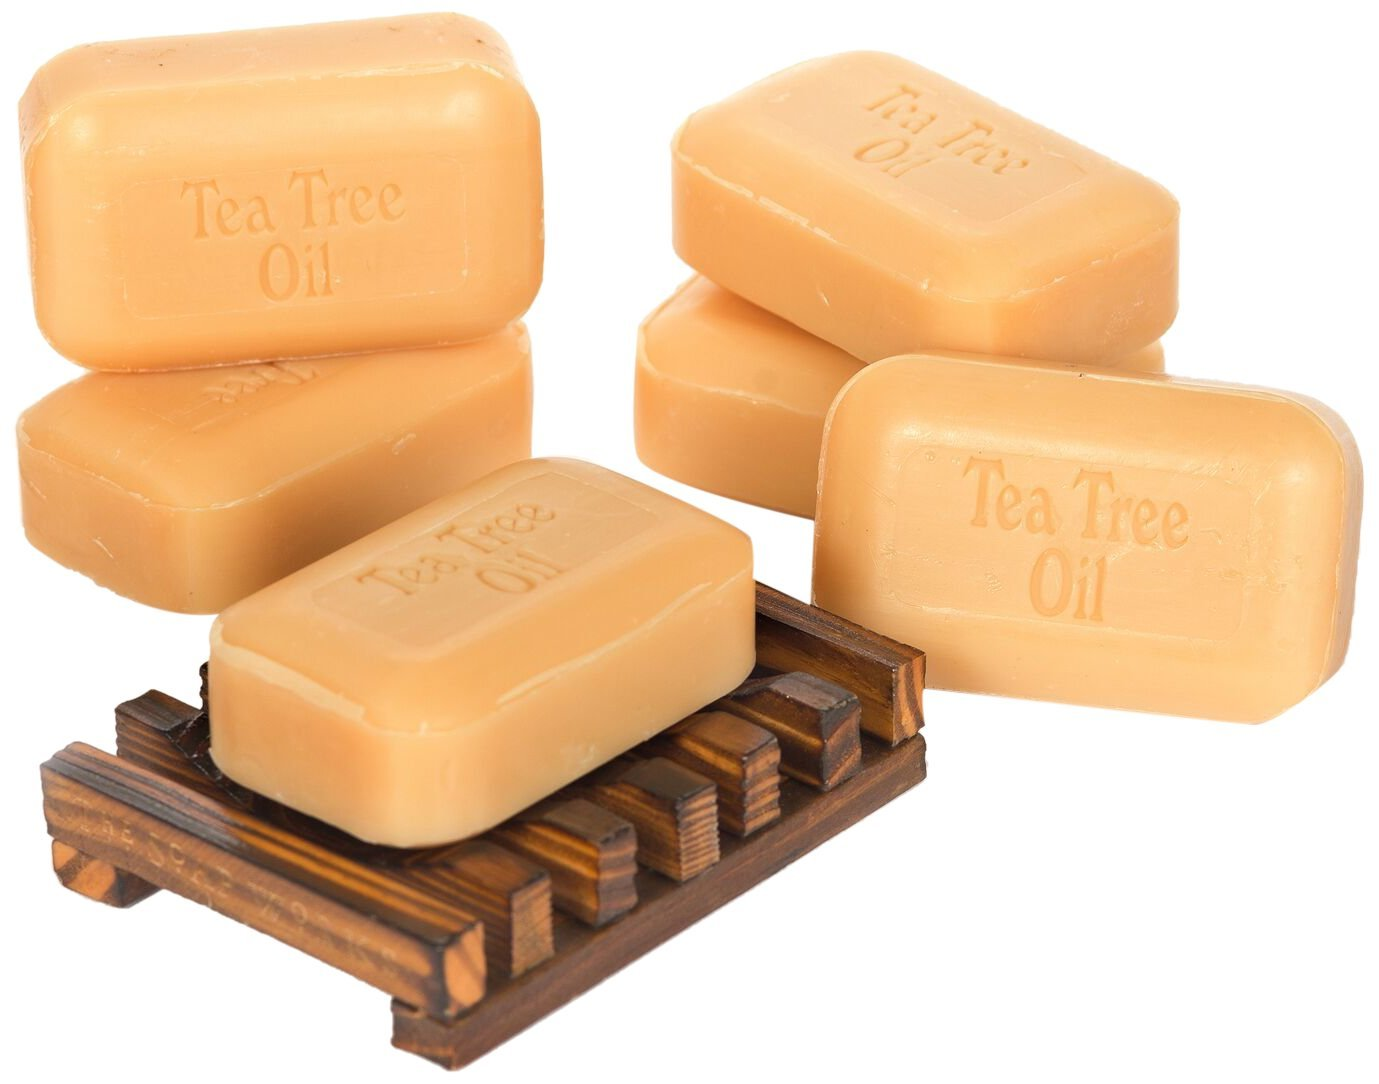 Soap Works Tea Tree Oil Soap Bar, 6-Count